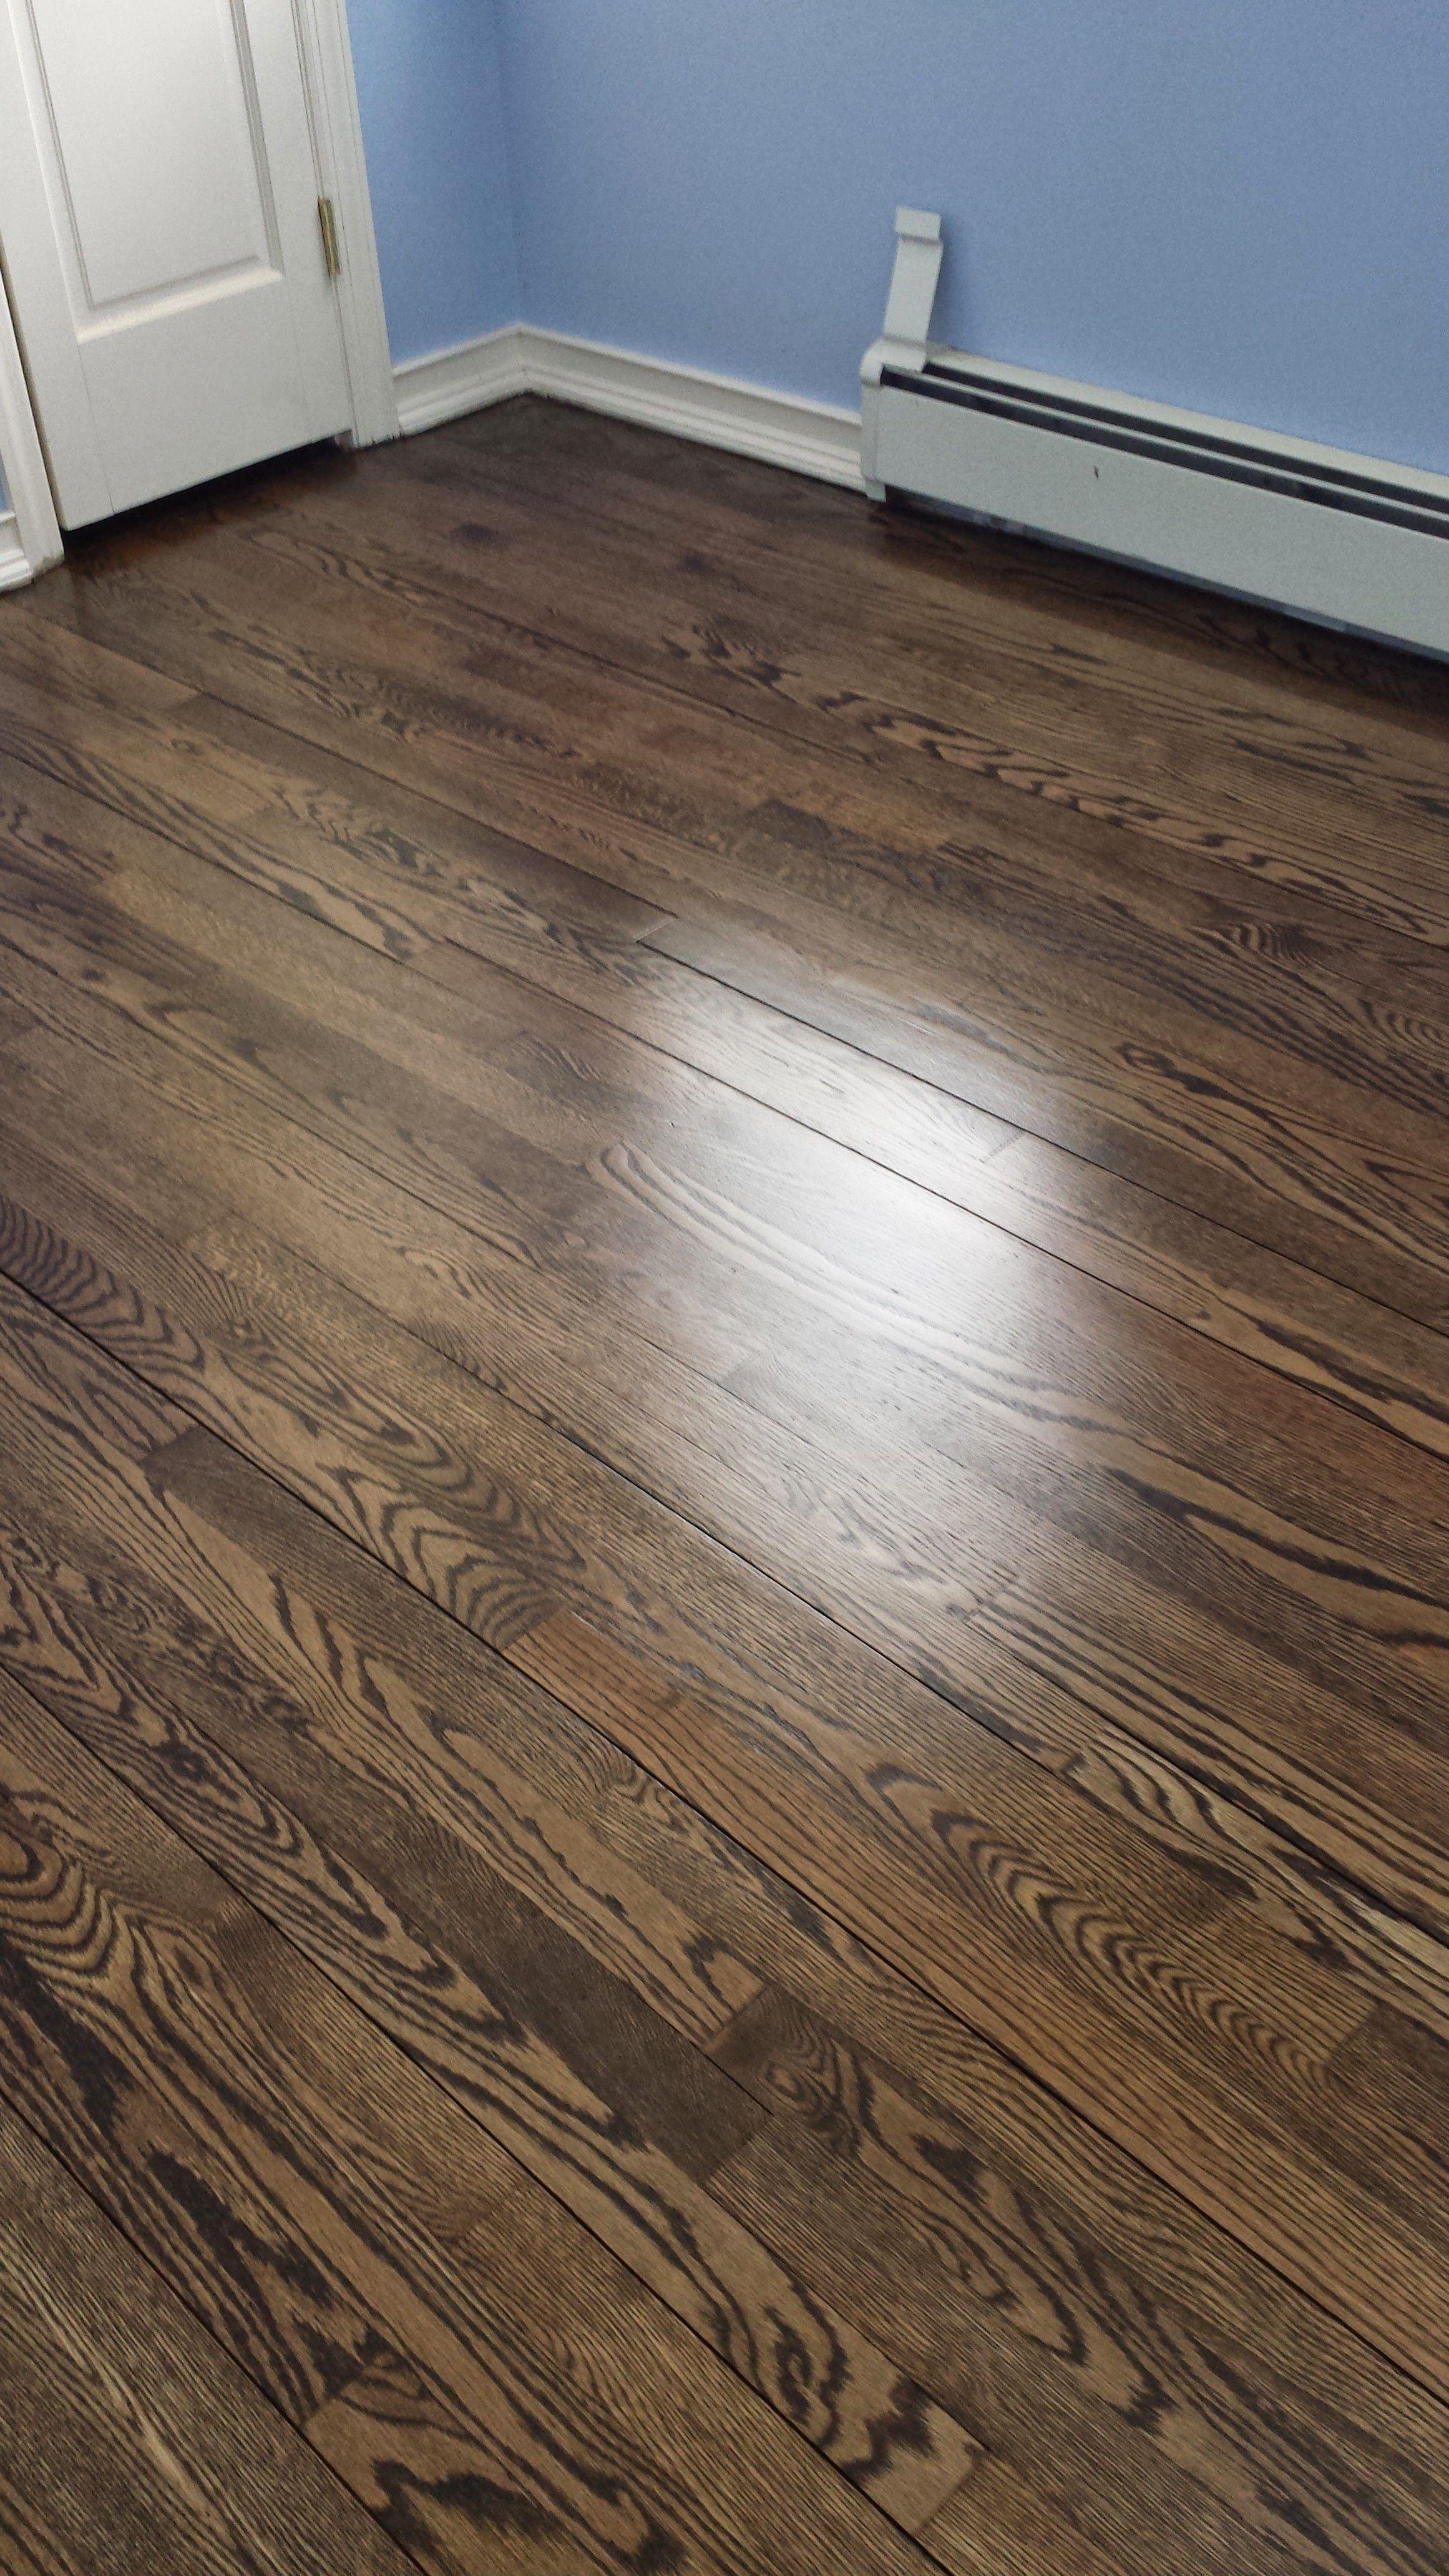 hardwood floor refinishing ottawa ontario of diy refinish hardwood floors adventures in staining my red oak in flooring vs replacing refinish diy refinish hardwood floors great methods to use for refinishing hardwood floors